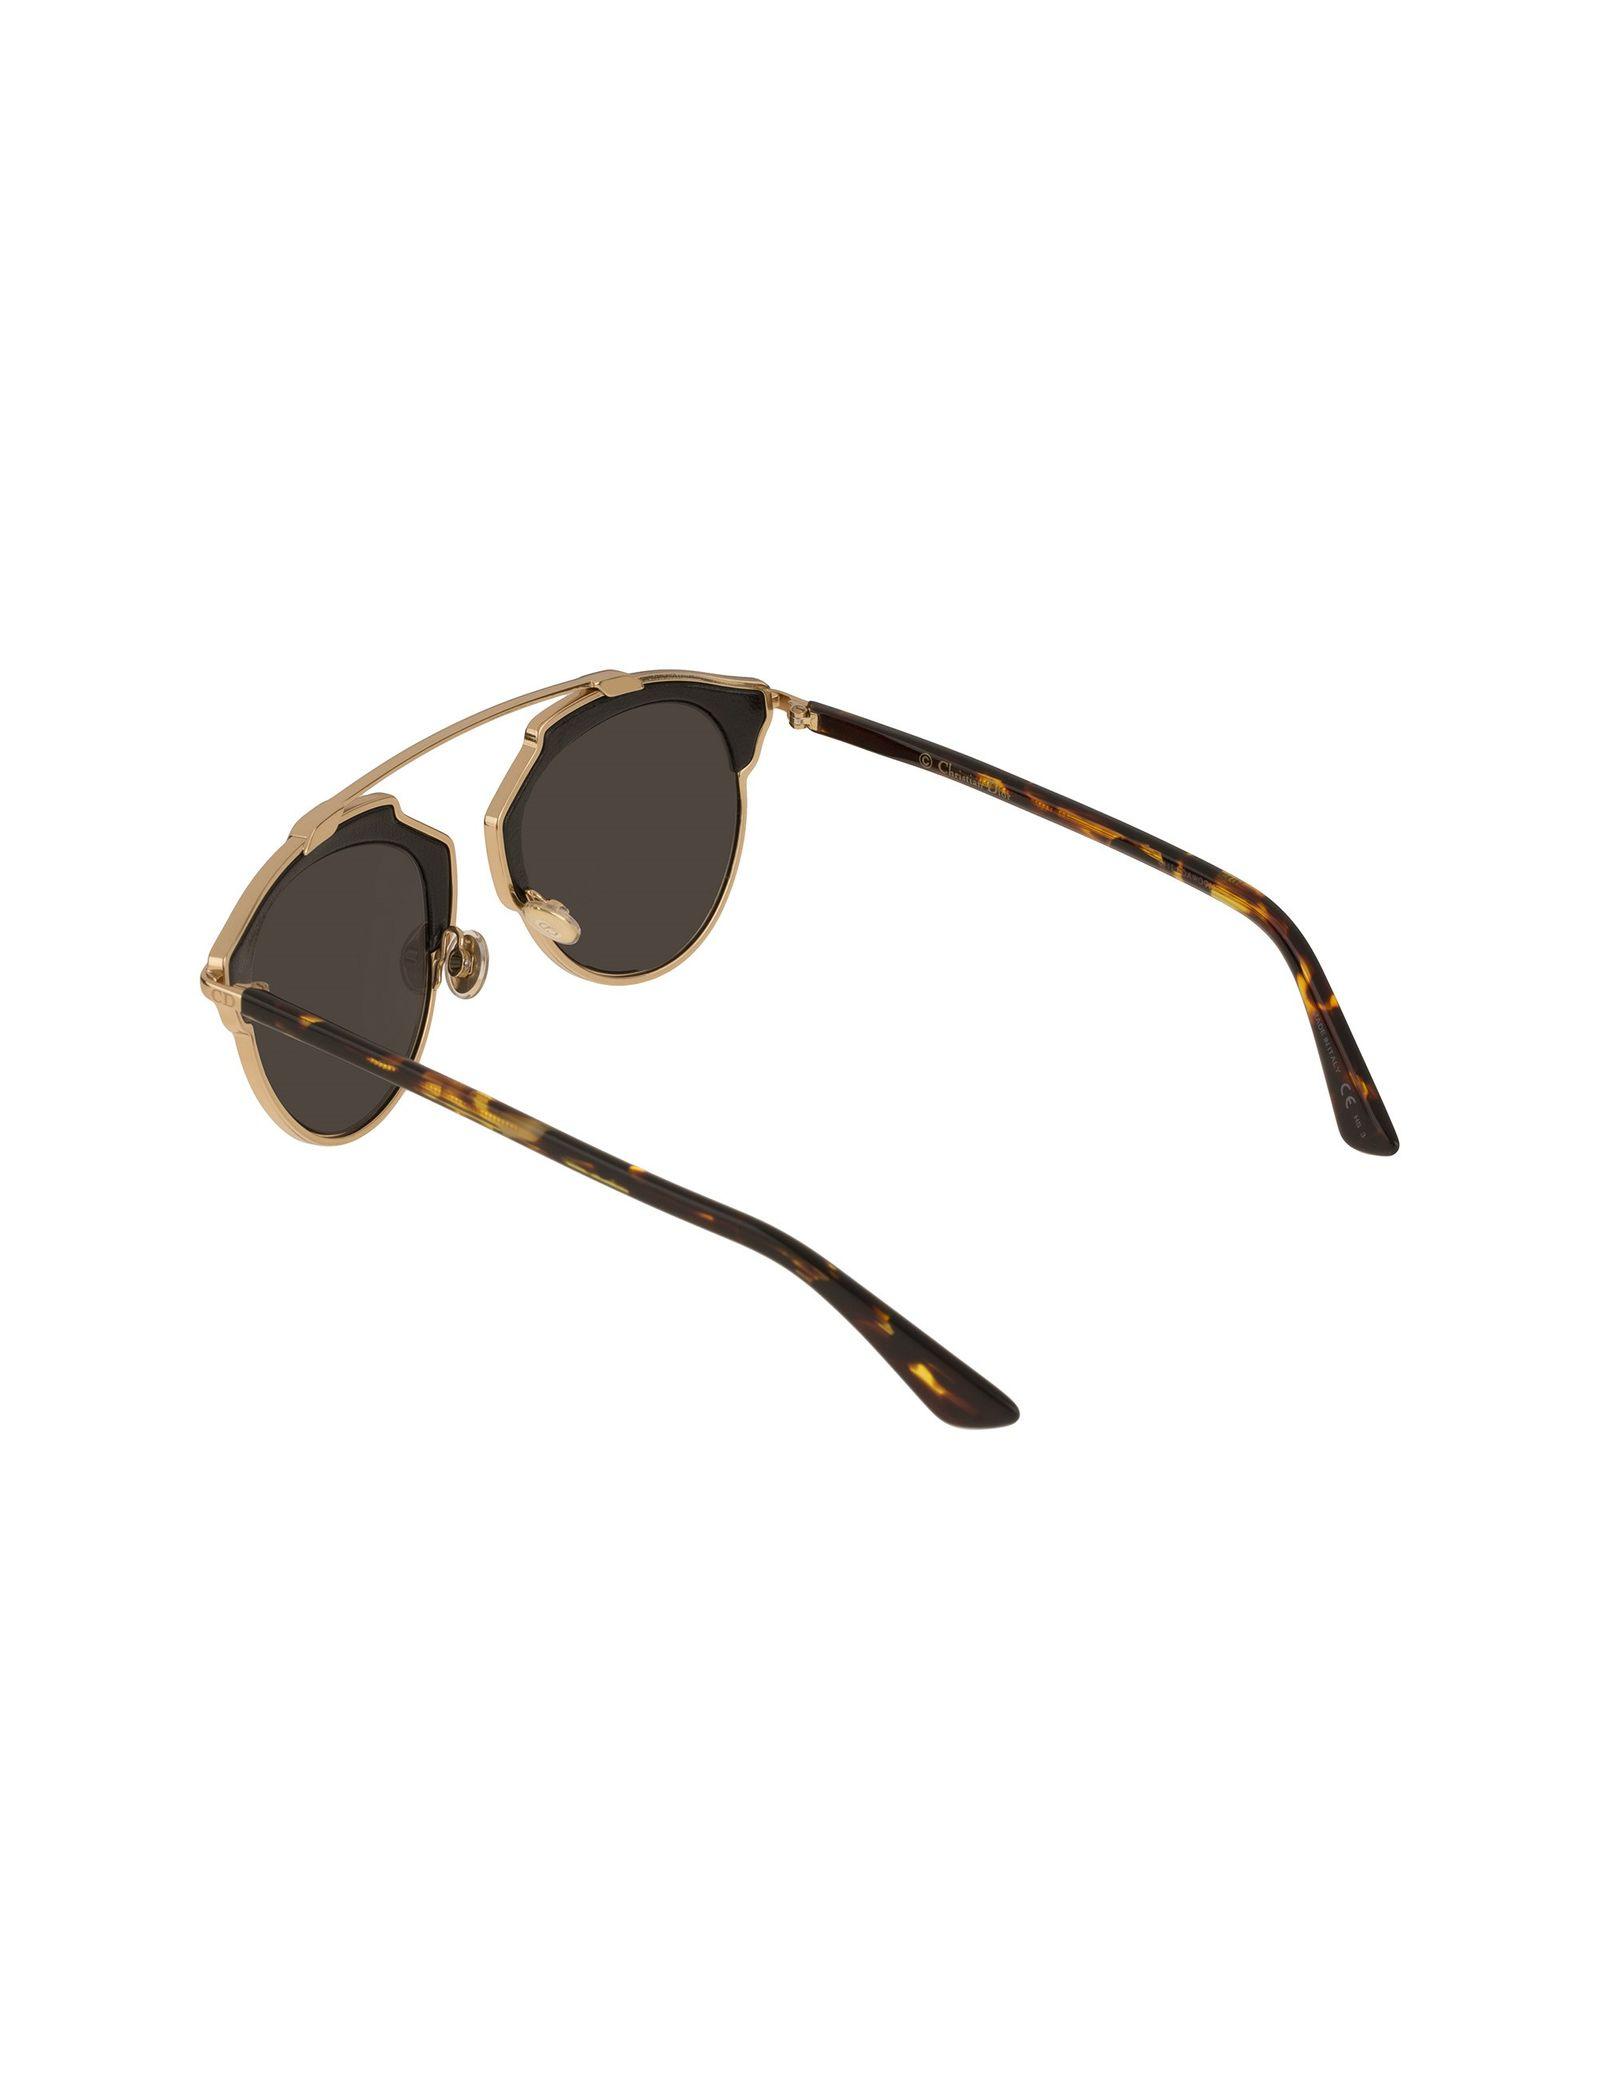 عینک آفتابی پنتوس زنانه - دیور - مشکي و طلايي - 4